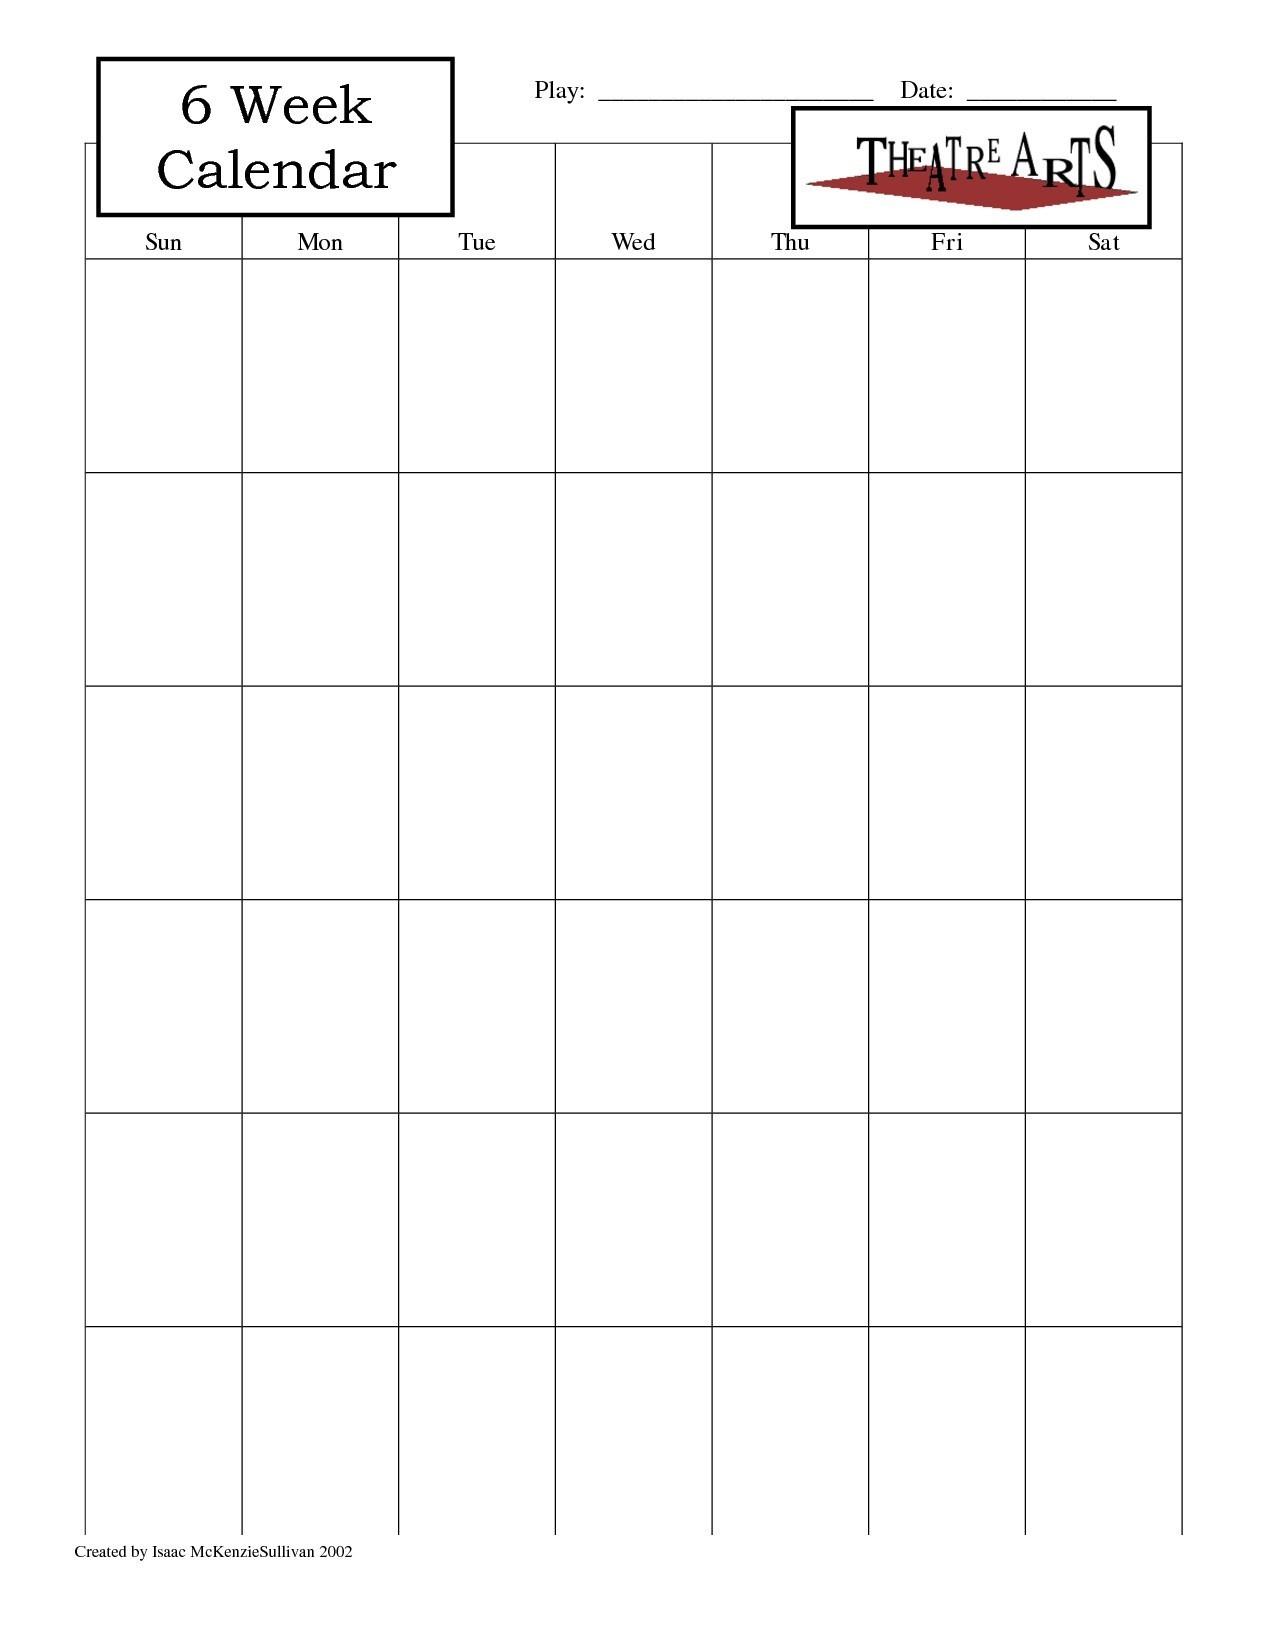 Blank 6 Week Calendar Template With Weeks 25971 Also On 6 Week_Blank Calendar Template 6 Weeks